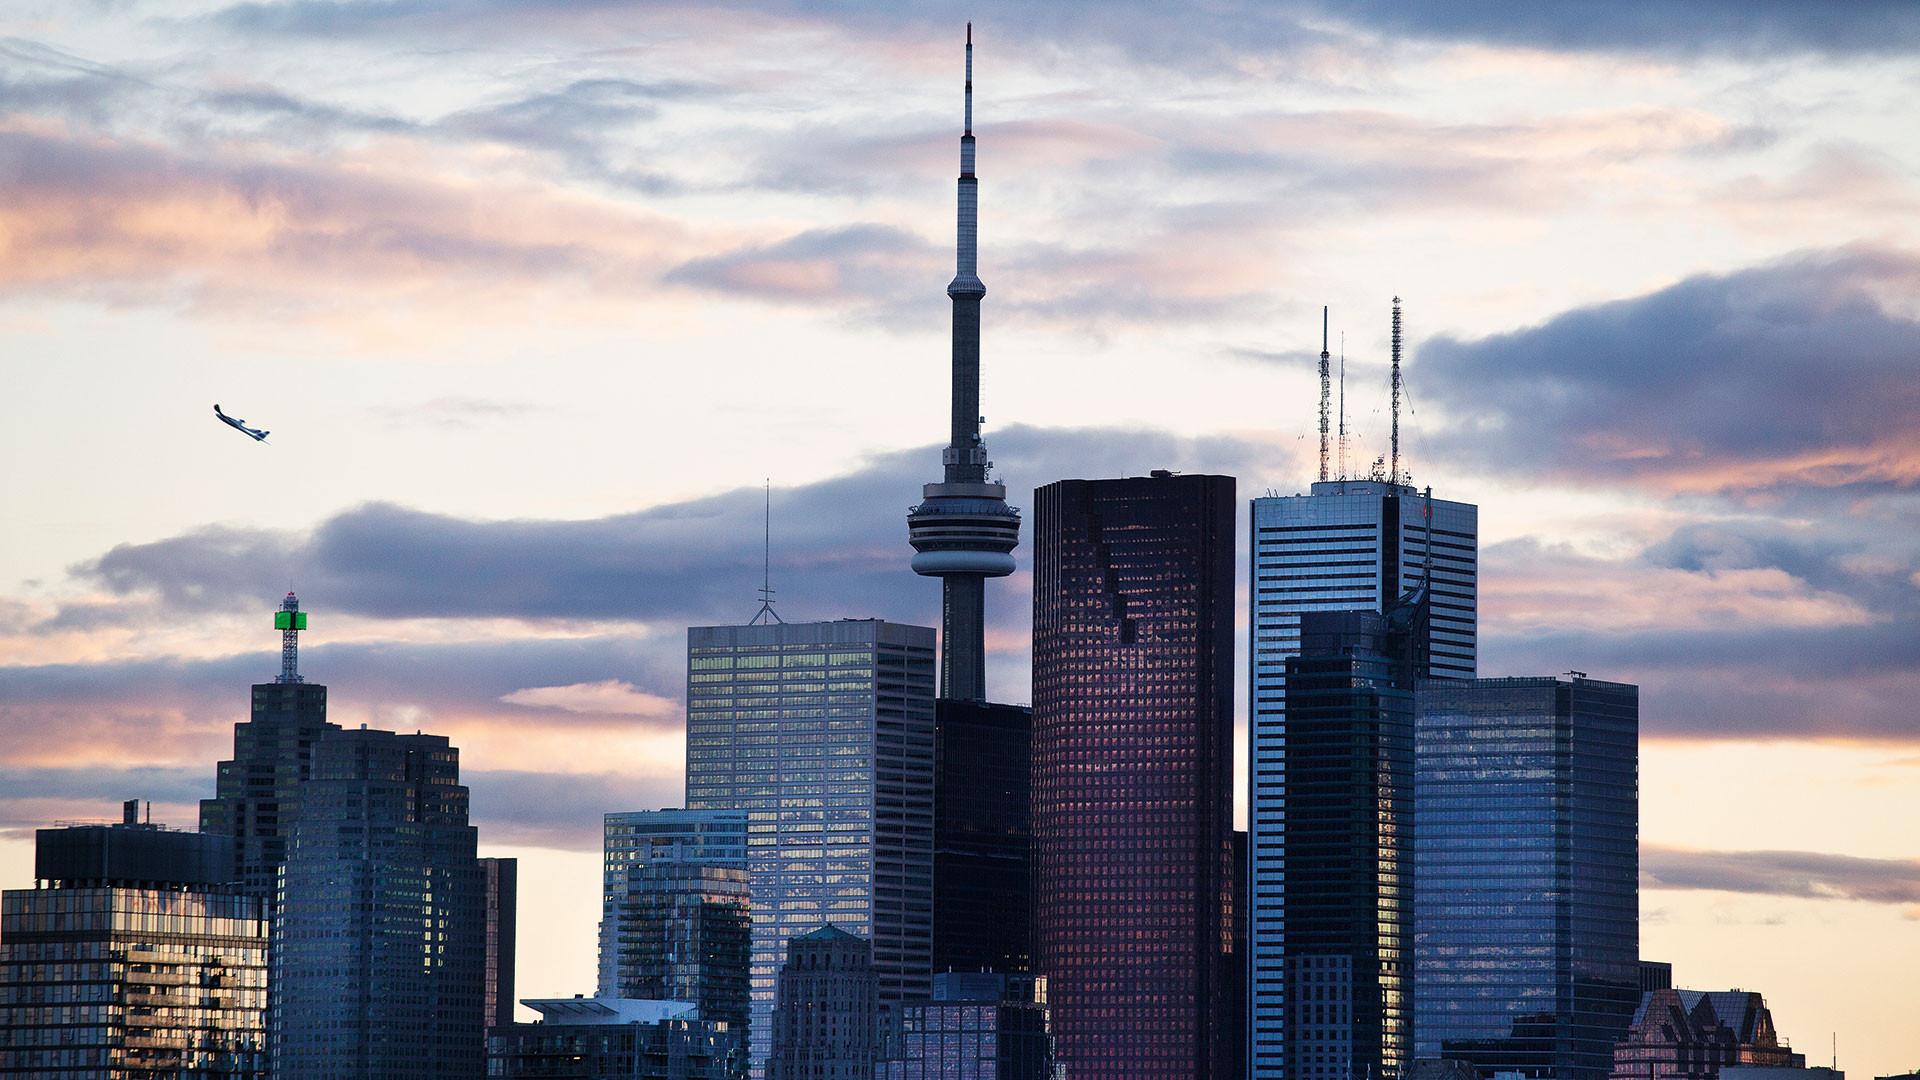 Toronto's iconic skyline